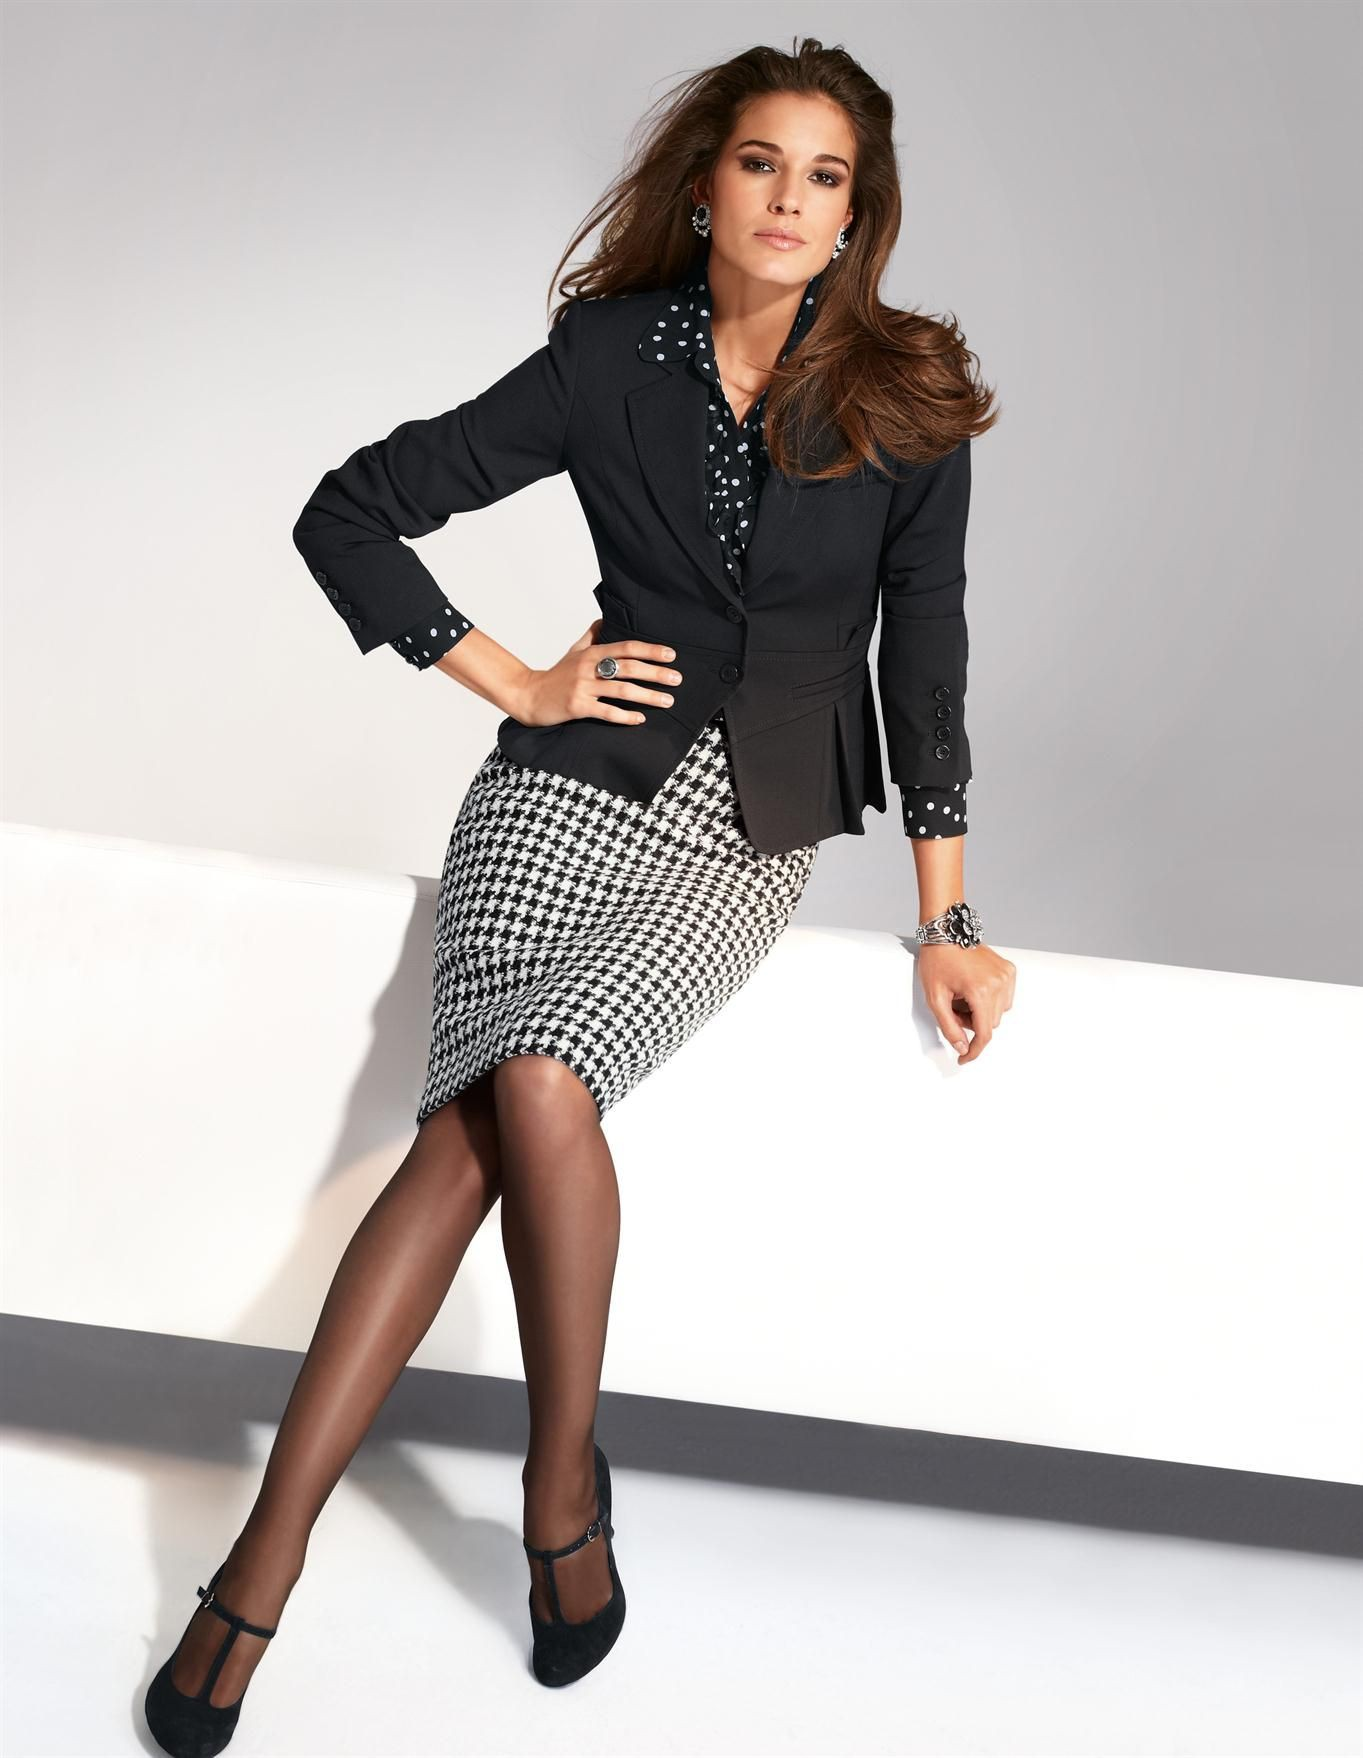 Colour outfit look ejecutivo mujer, fashion model, photo shoot, lapel pin, polka dot